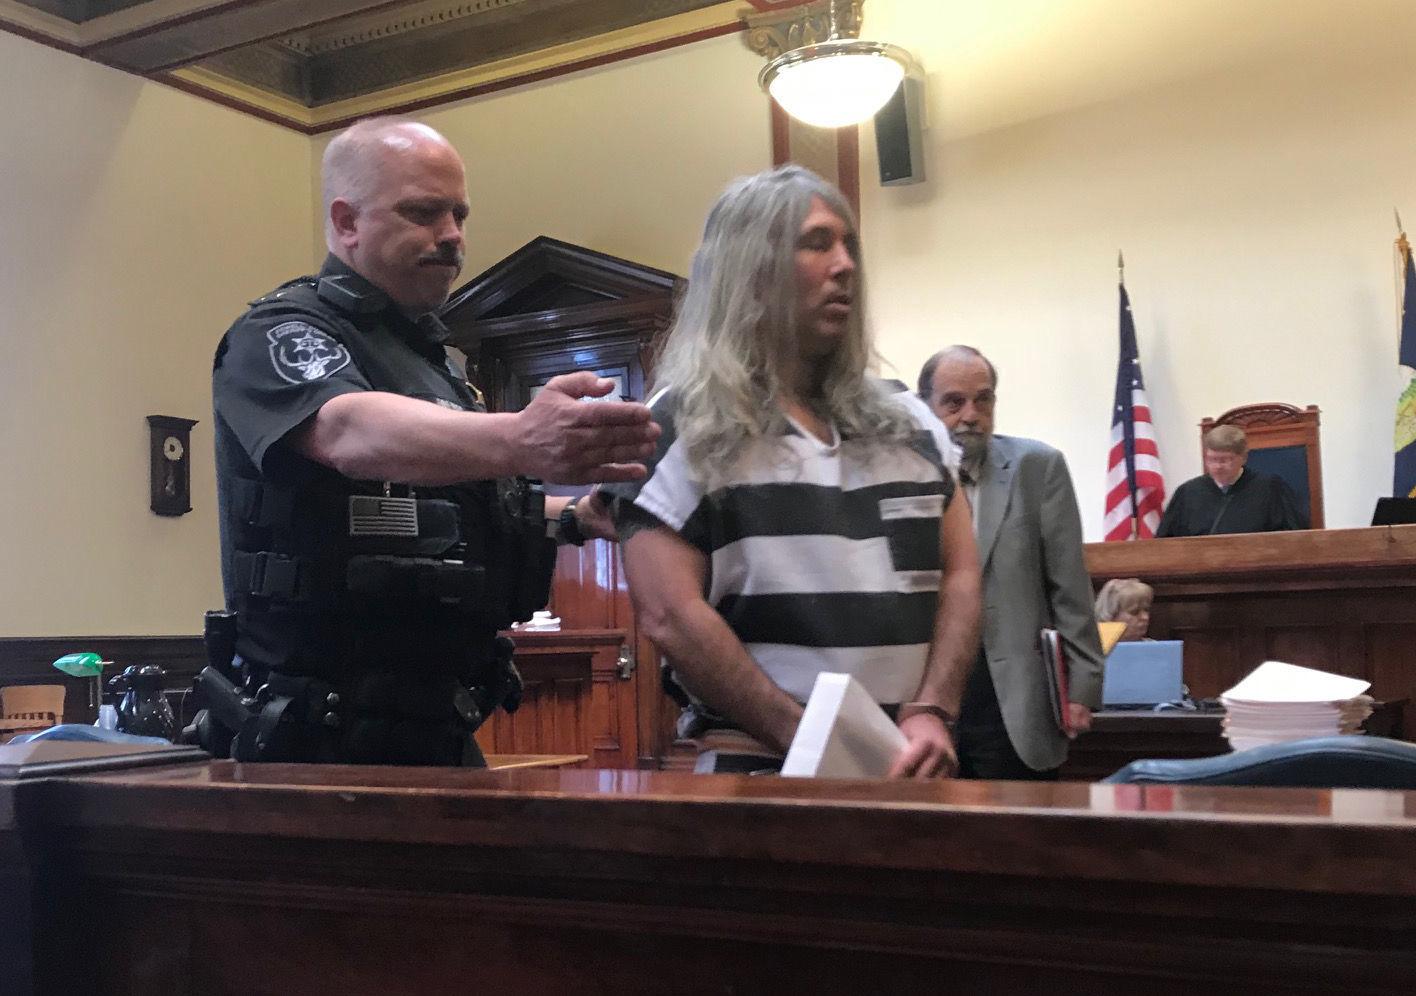 A Powell County Sheriffu0027s Deputy Escorts Josiah Wright From District Judge  Kurt Kruegeru0027s Courtroom In Butte On Thursday Following Wrightu0027s  Arraignment On ...